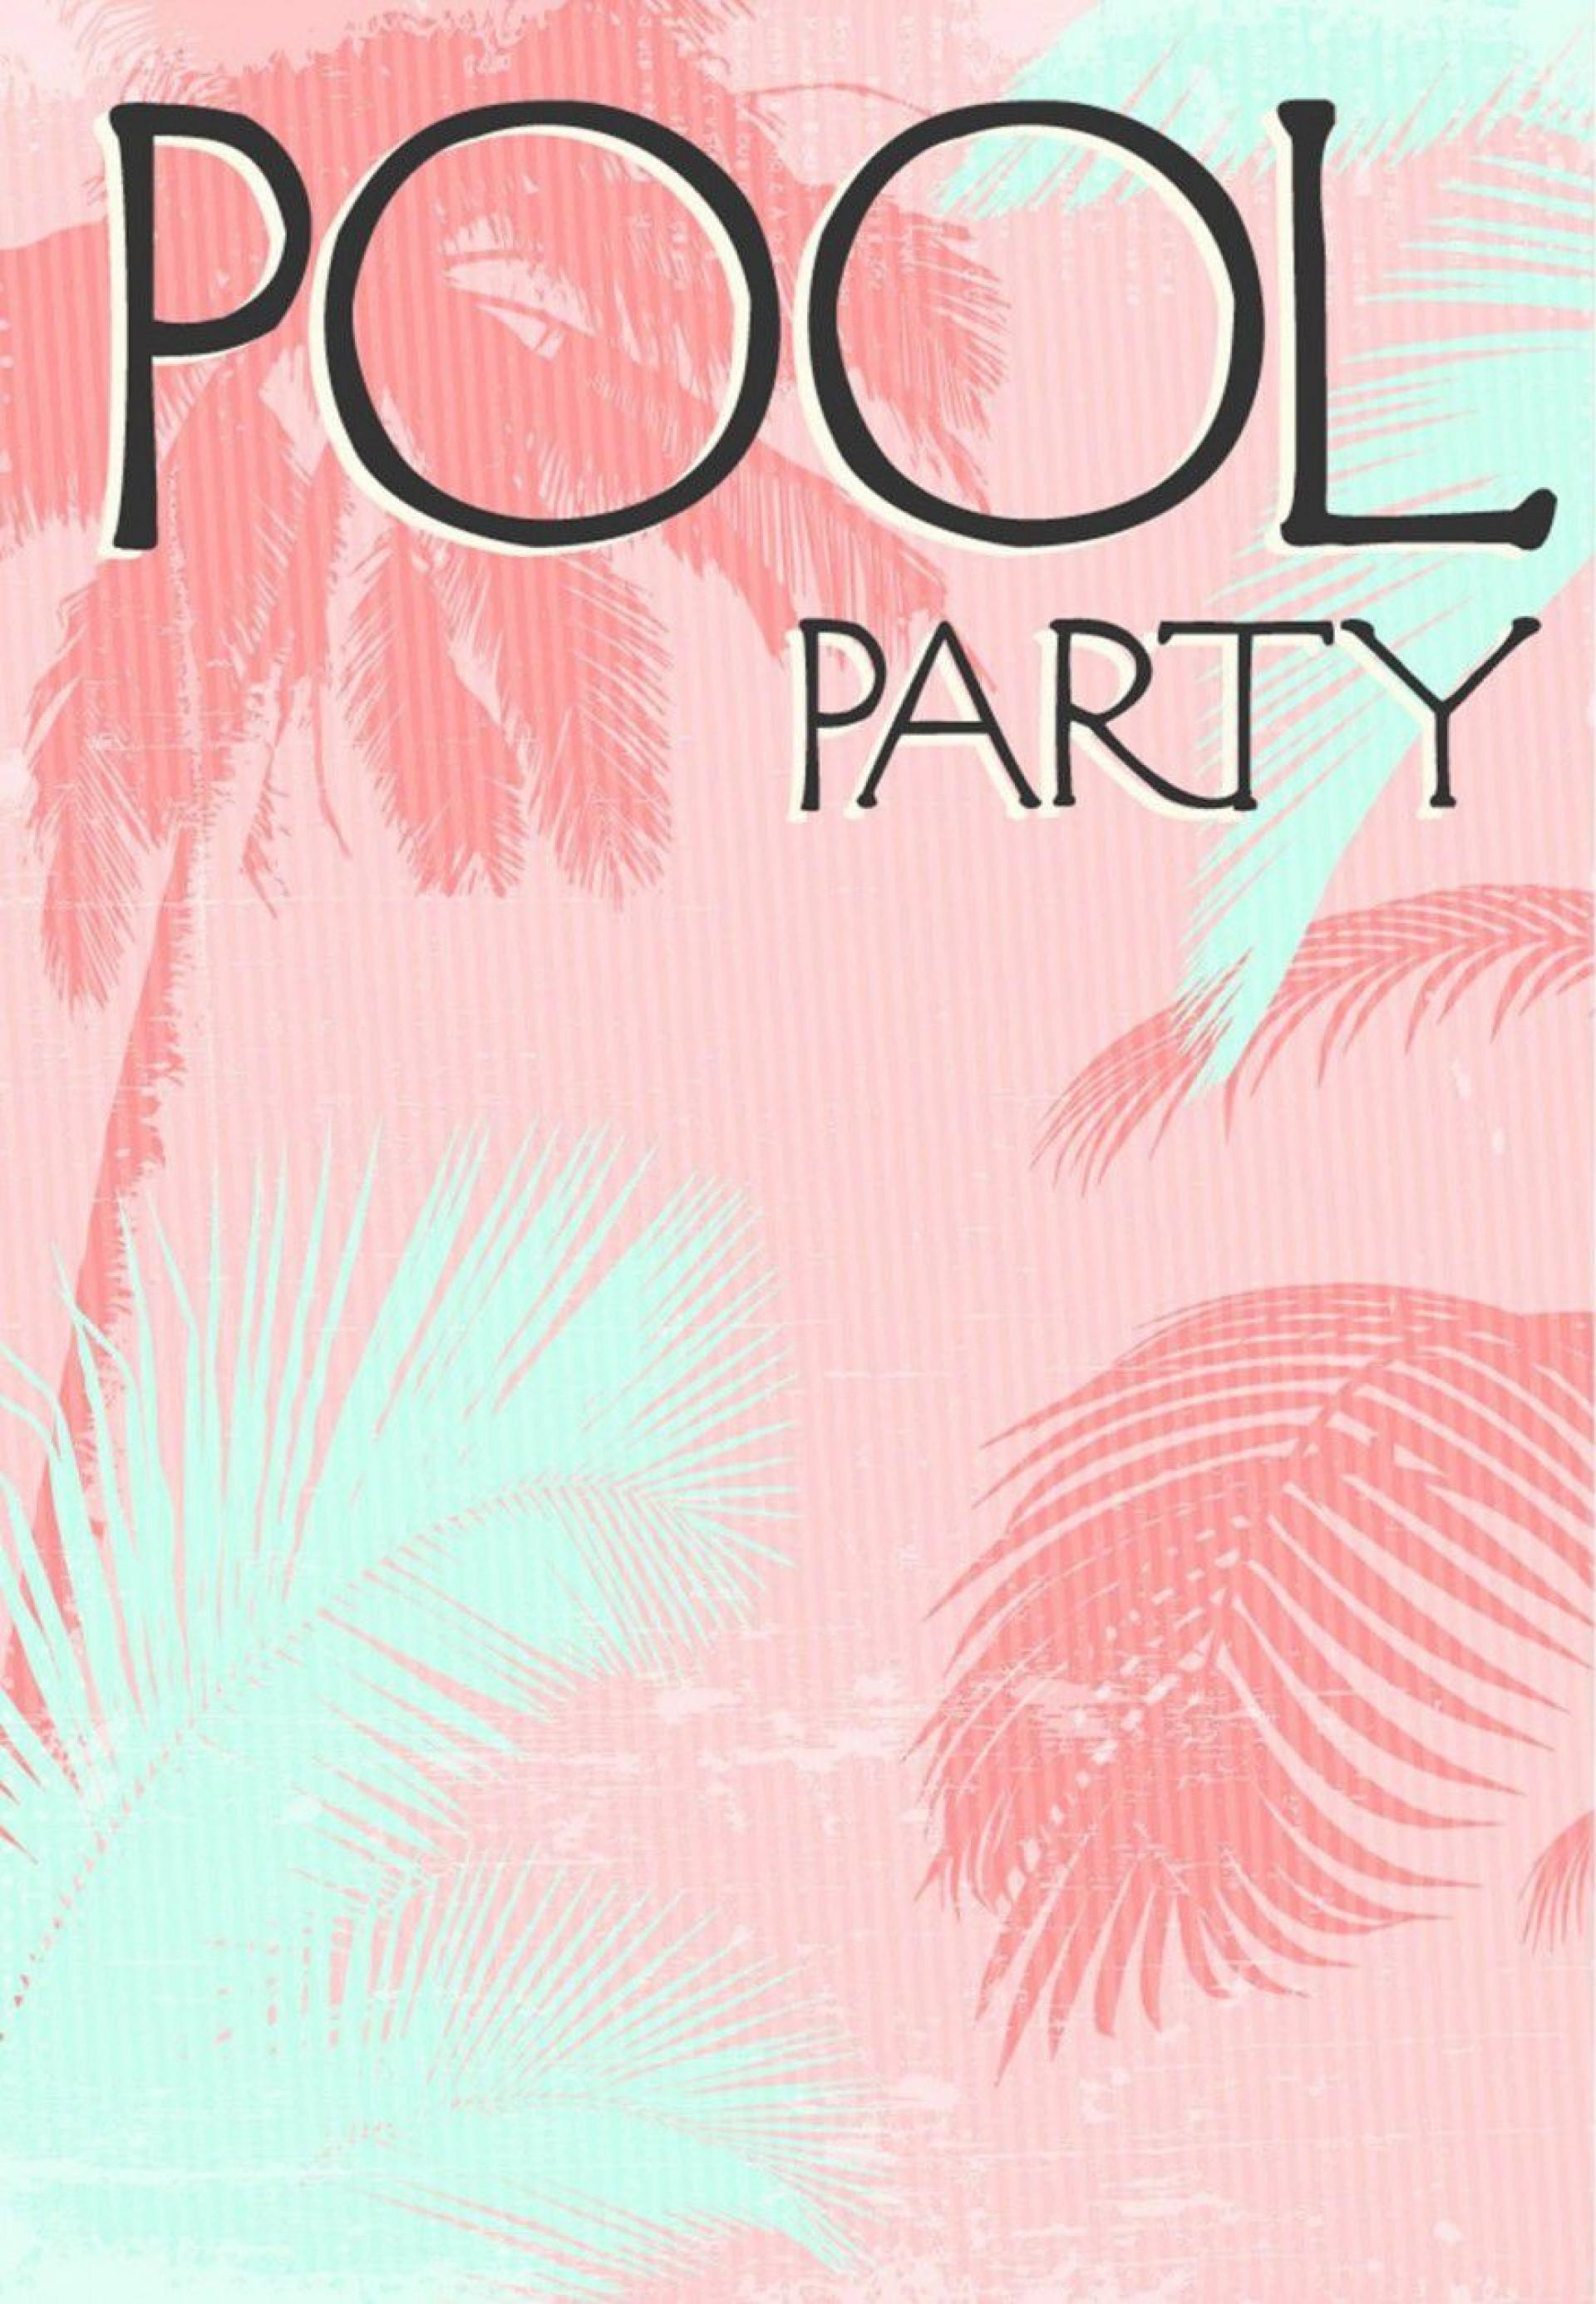 000 Wonderful Free Pool Party Invitation Template Printable Photo  Card Summer1920